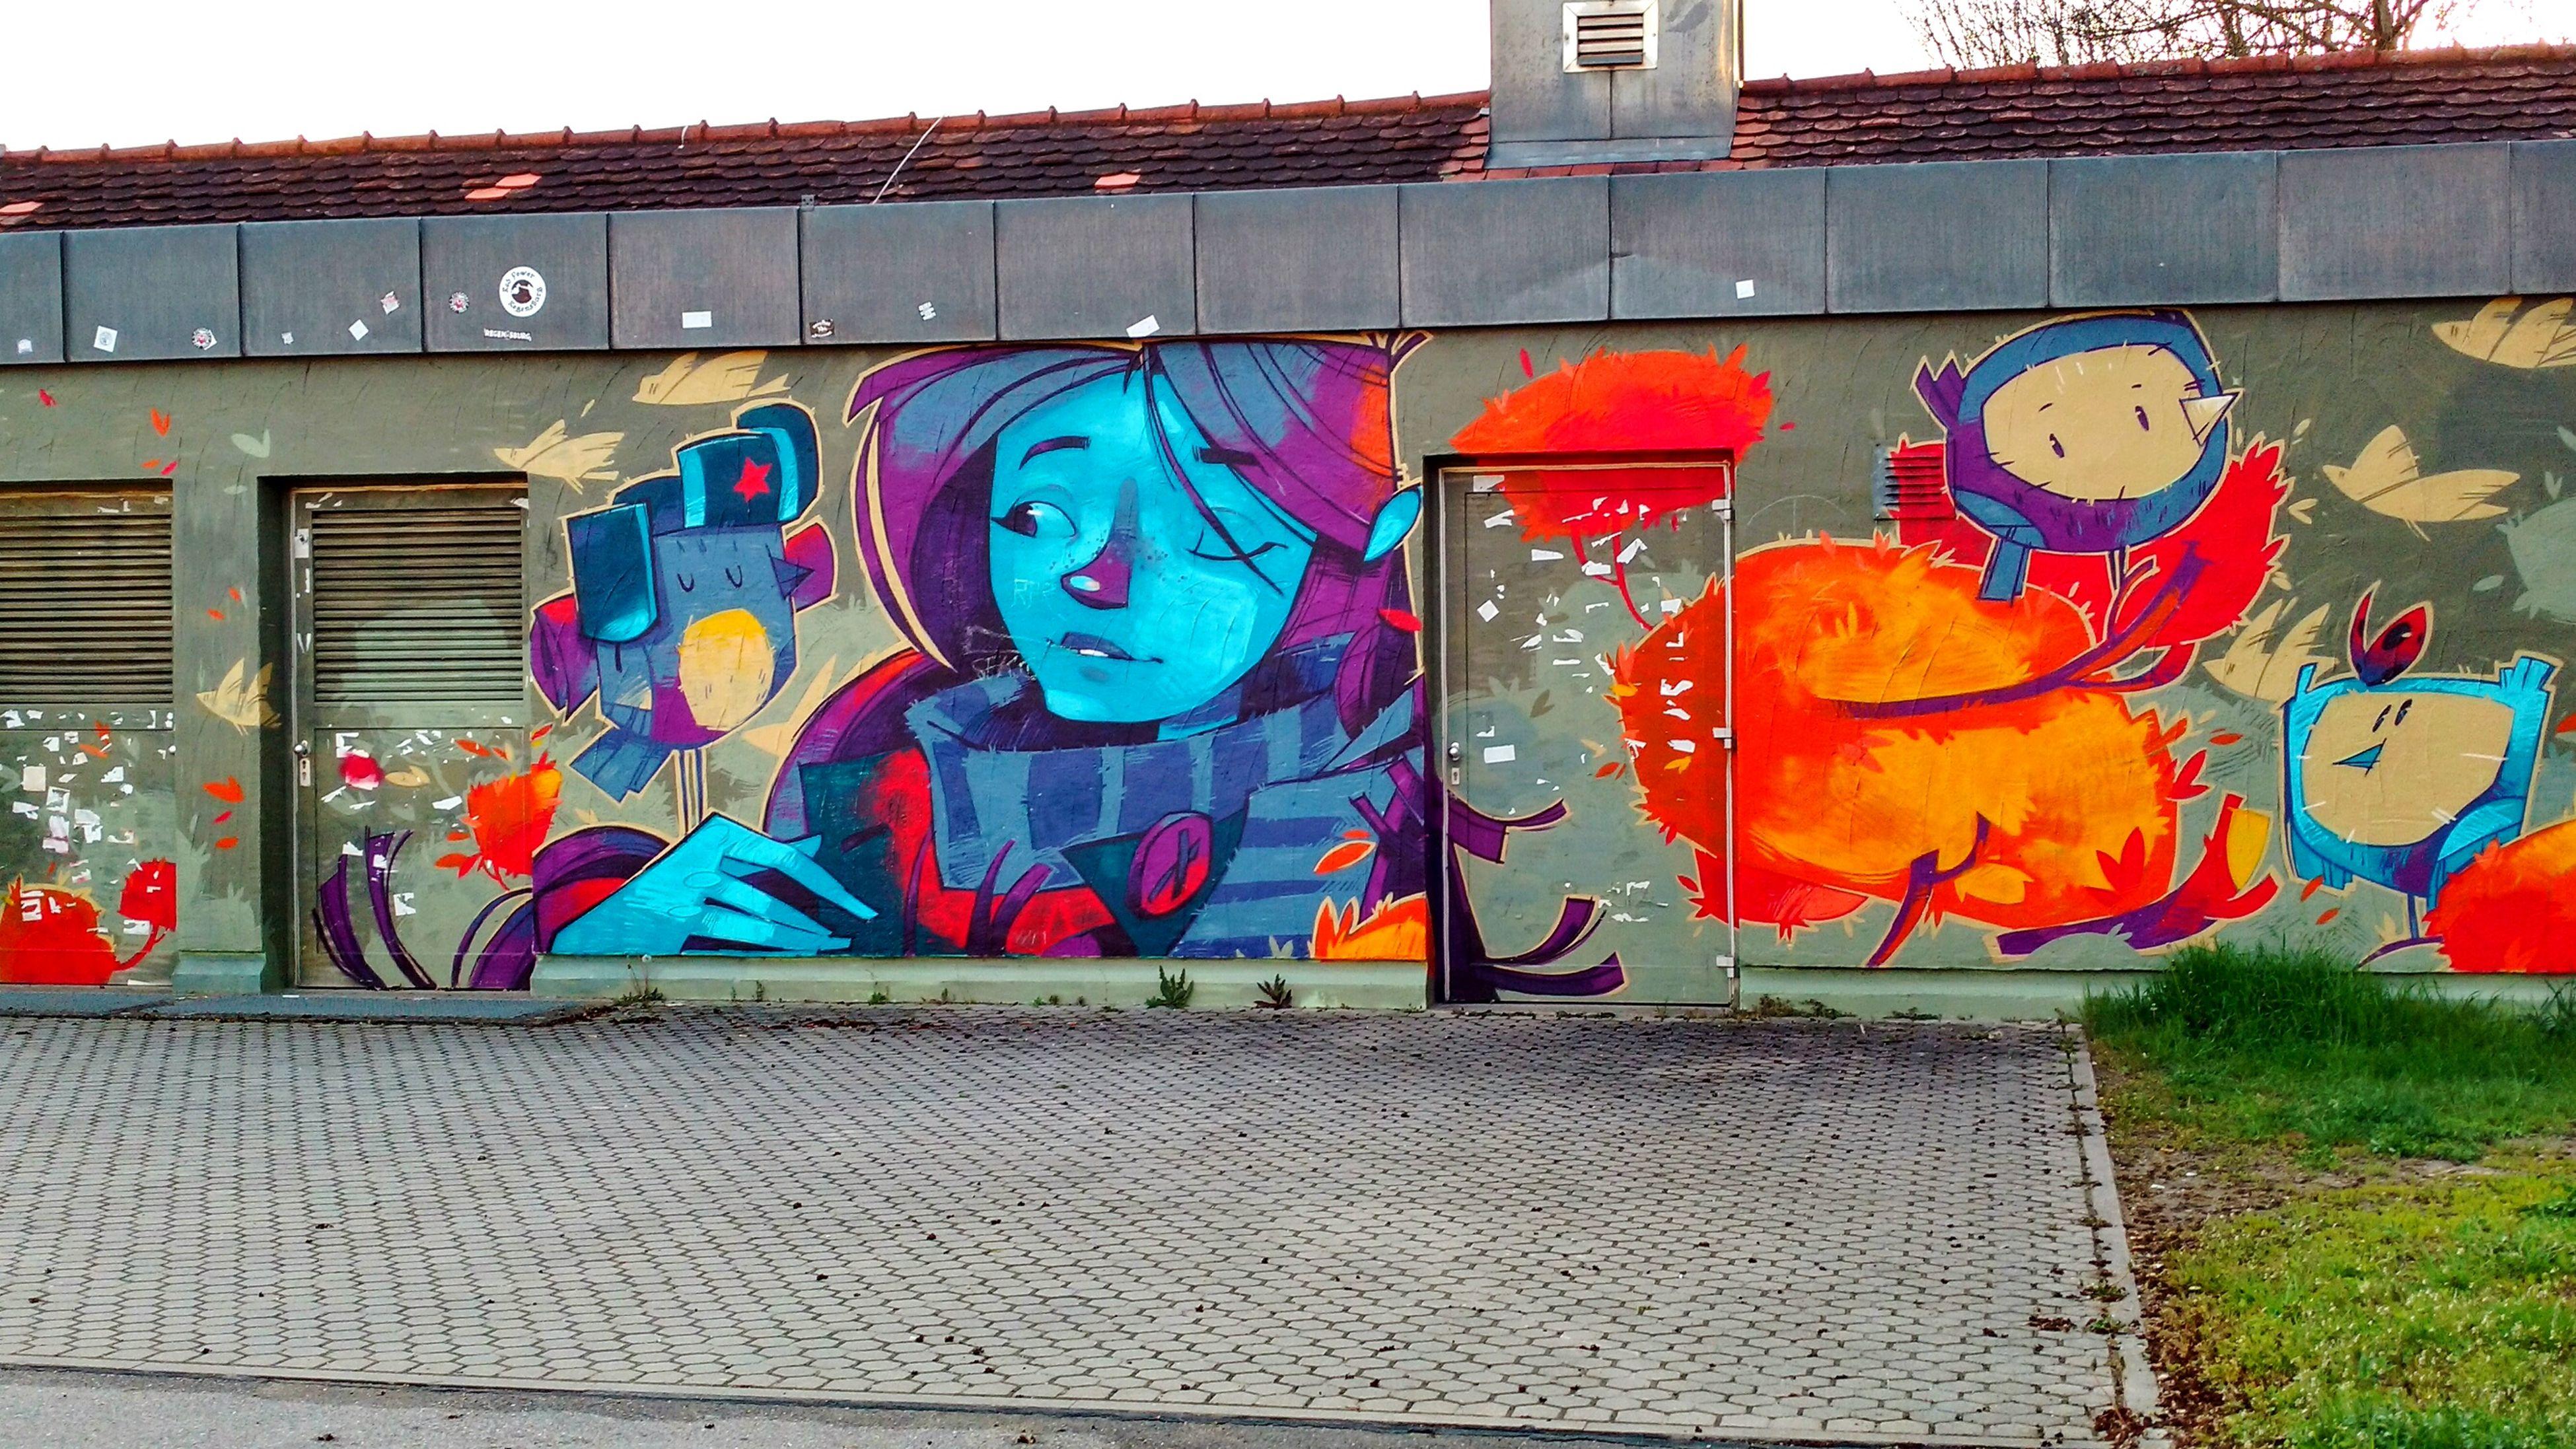 graffiti, multi colored, street art, art and craft, creativity, outdoors, day, spray paint, no people, city